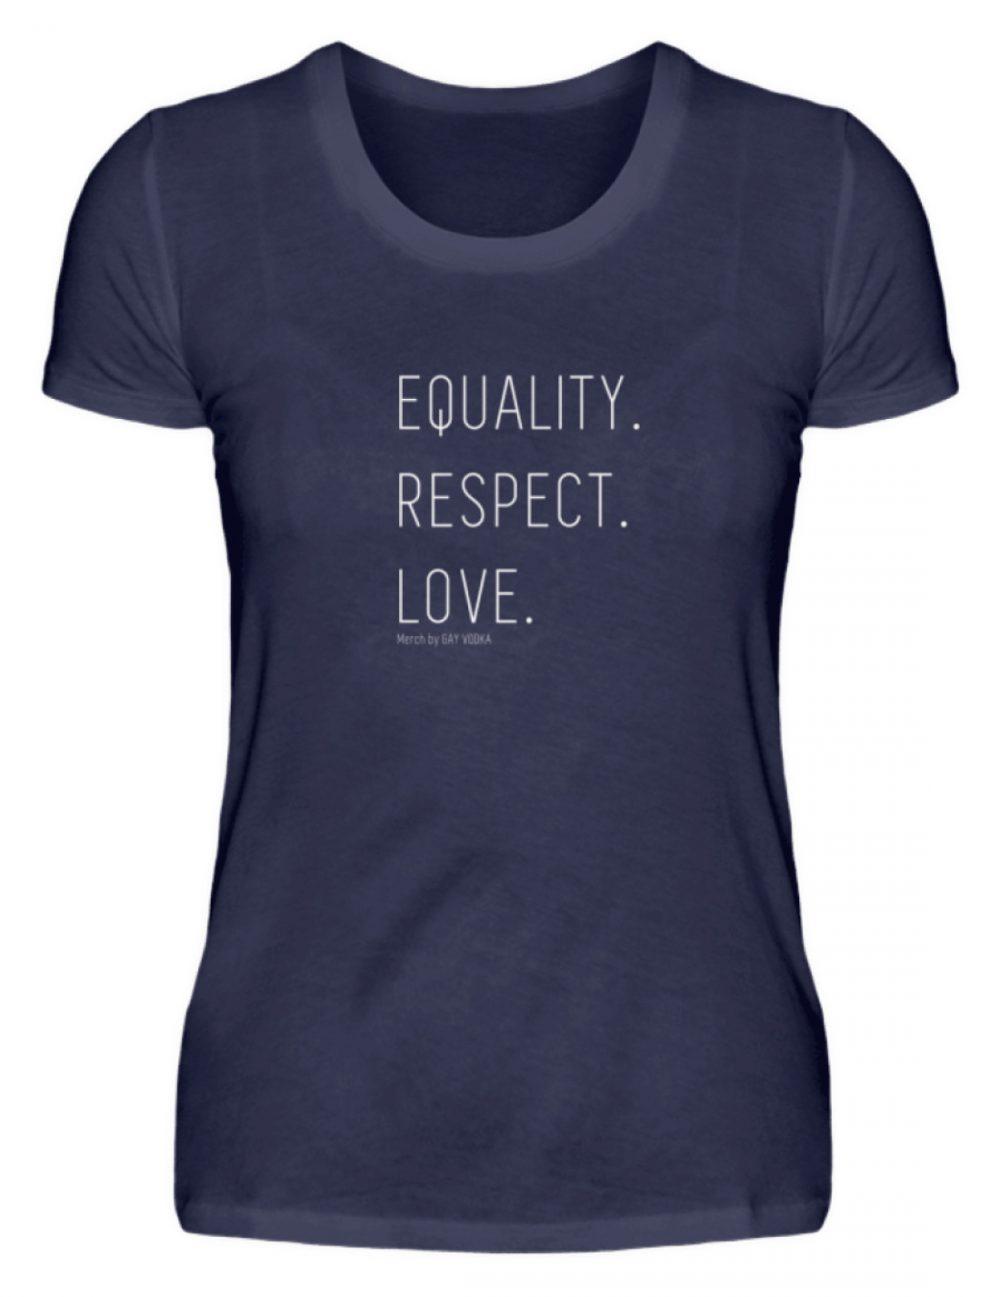 EQUALITY. RESPECT. LOVE. - Damen Premiumshirt-198